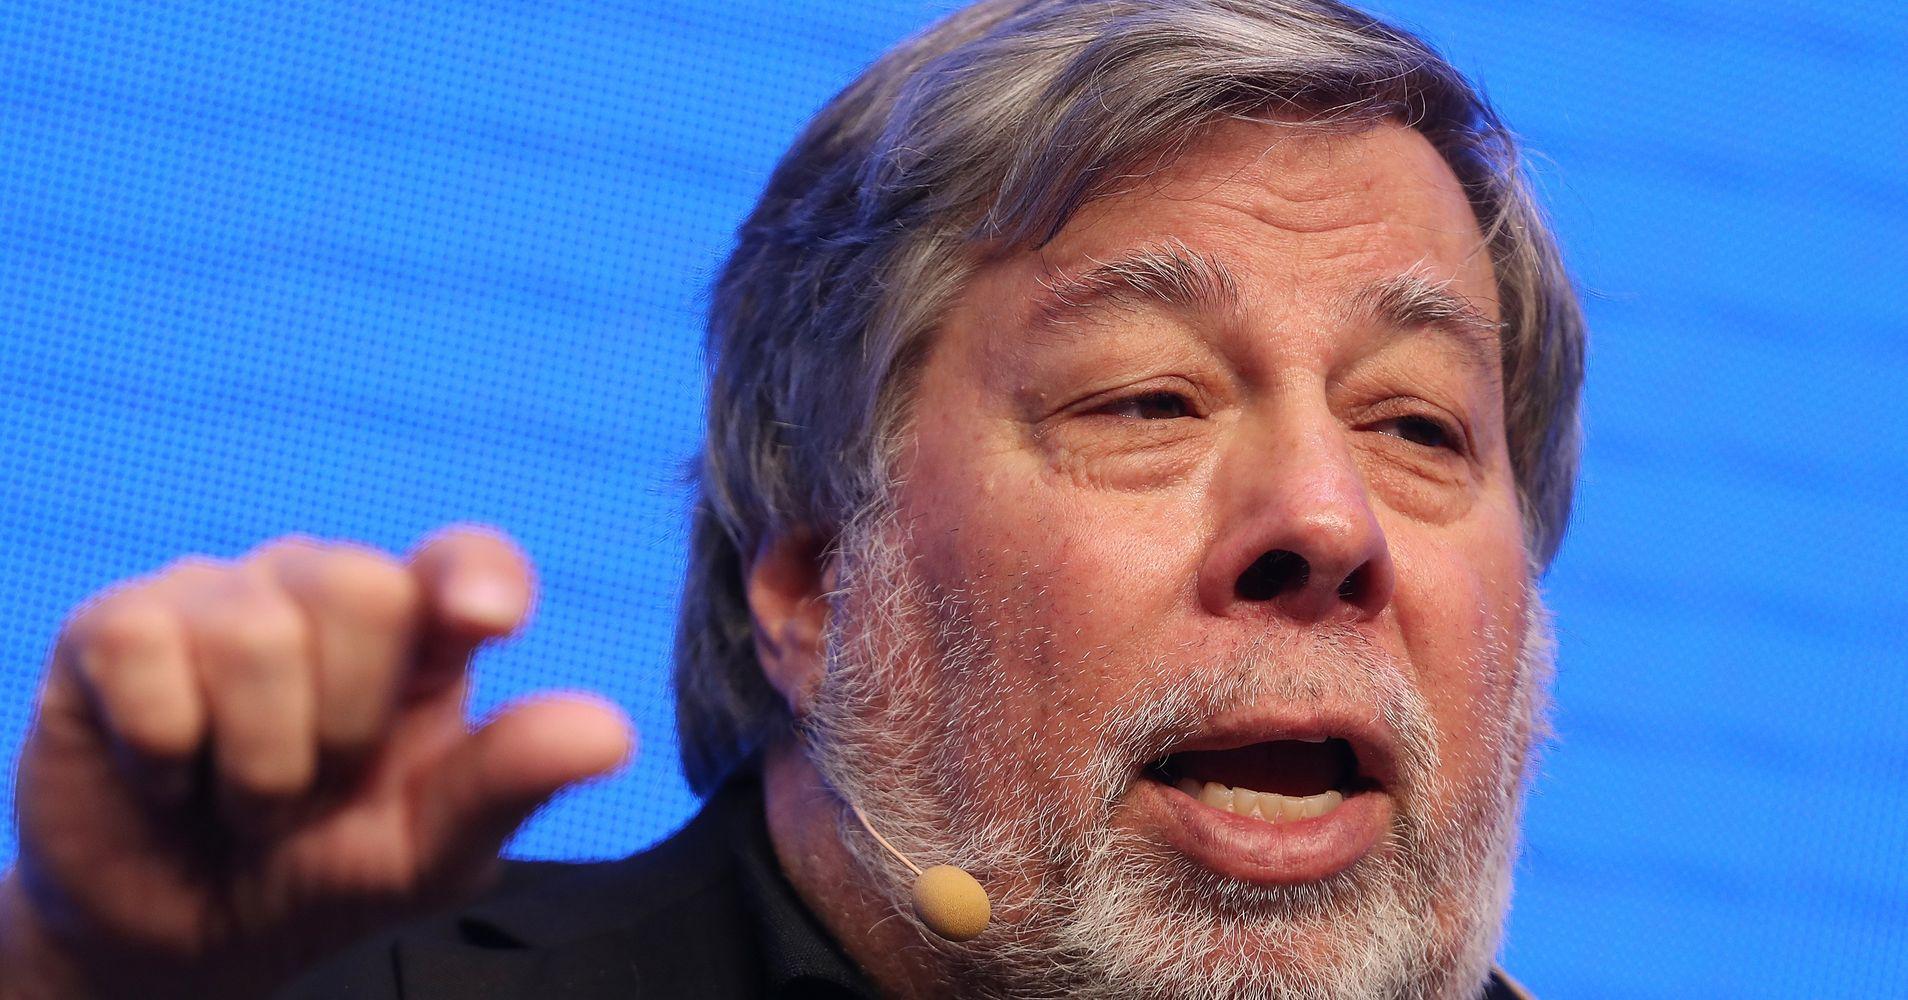 Apple Co-Founder Steve Wozniak Ditches Facebook